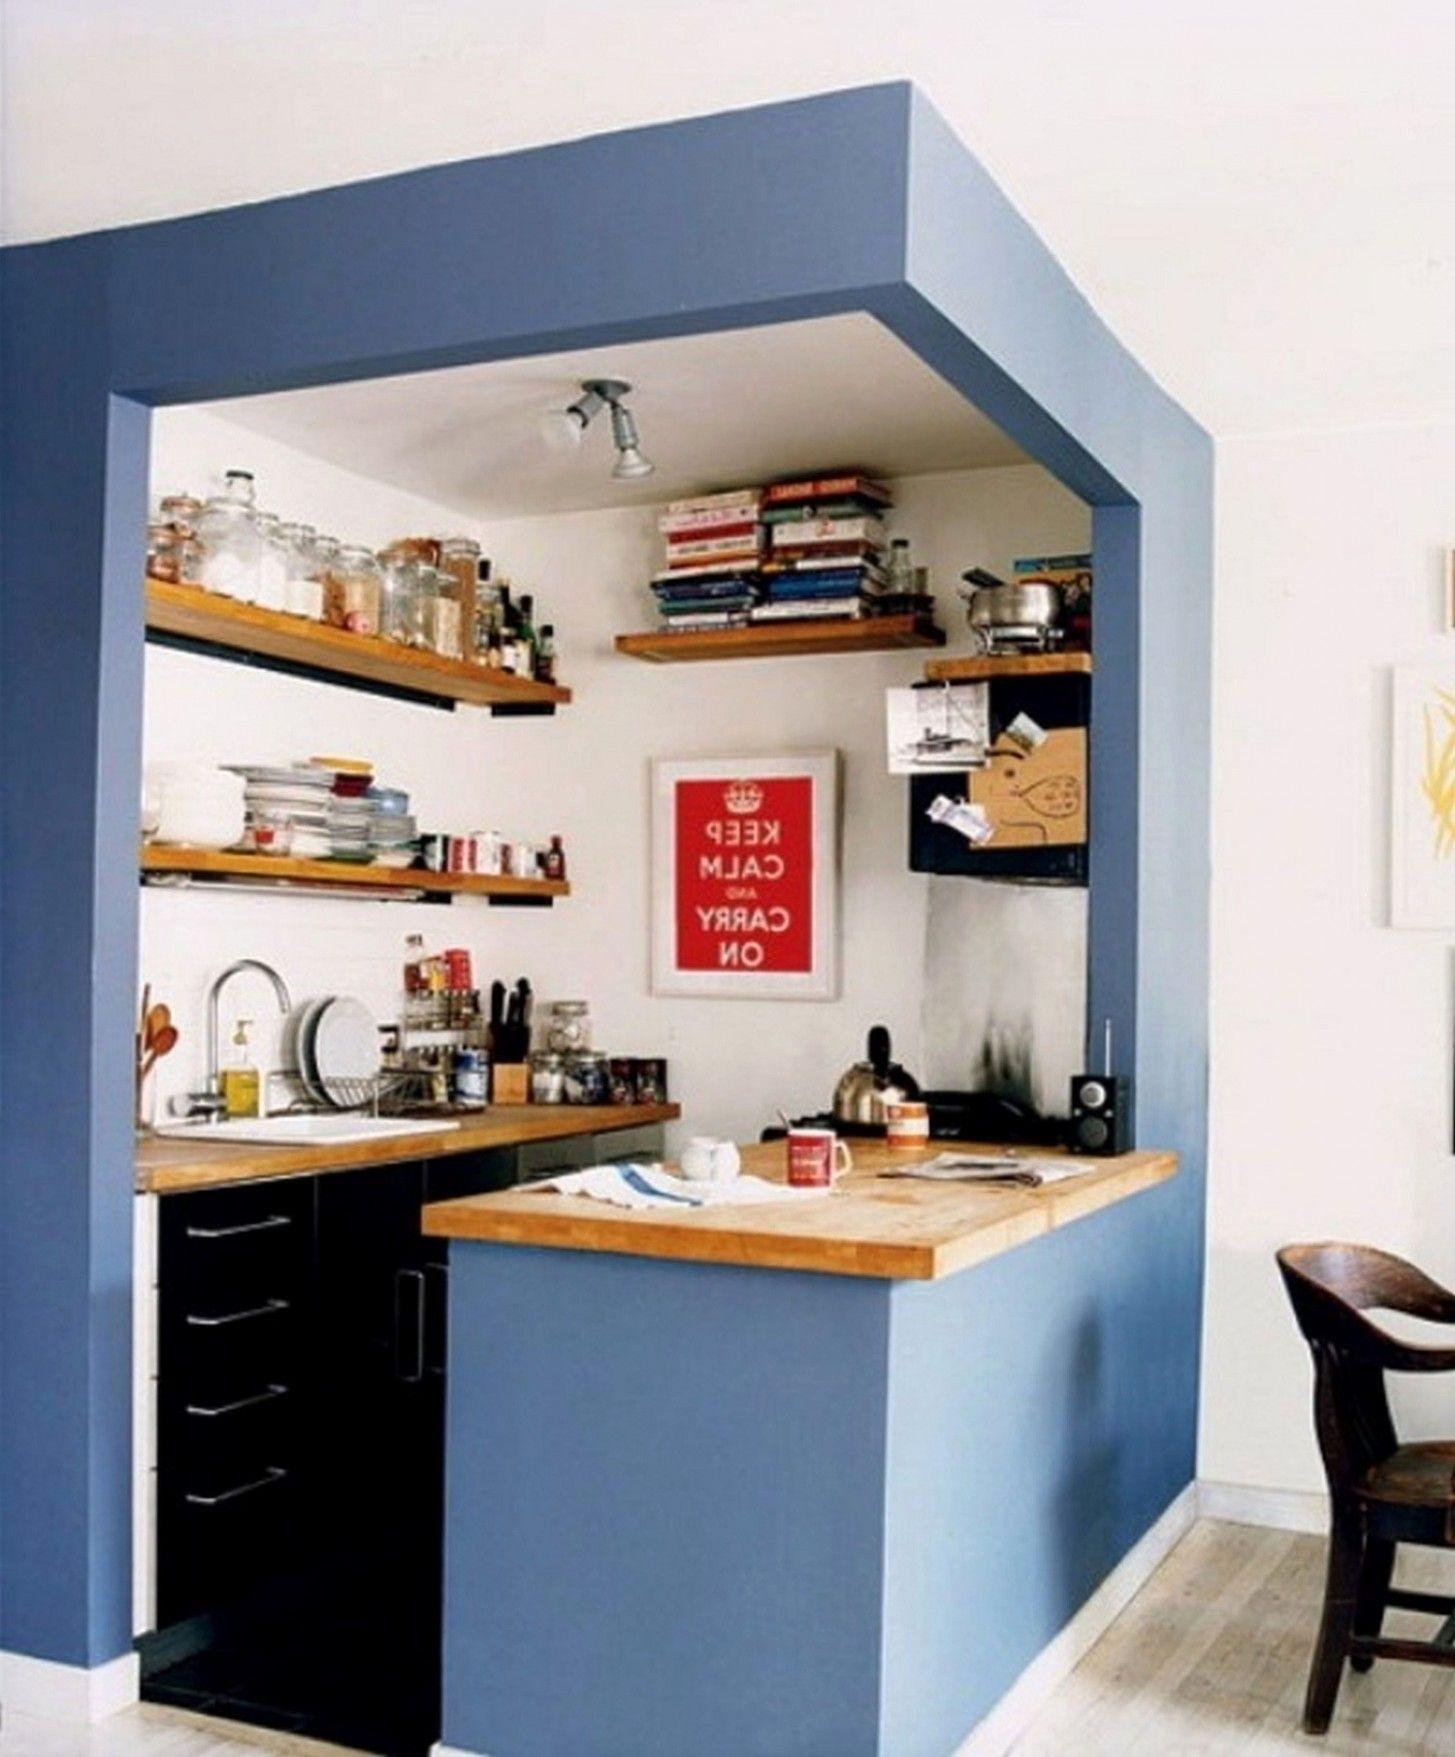 Student Kitchen Set Ikea - Tentang Kitchen